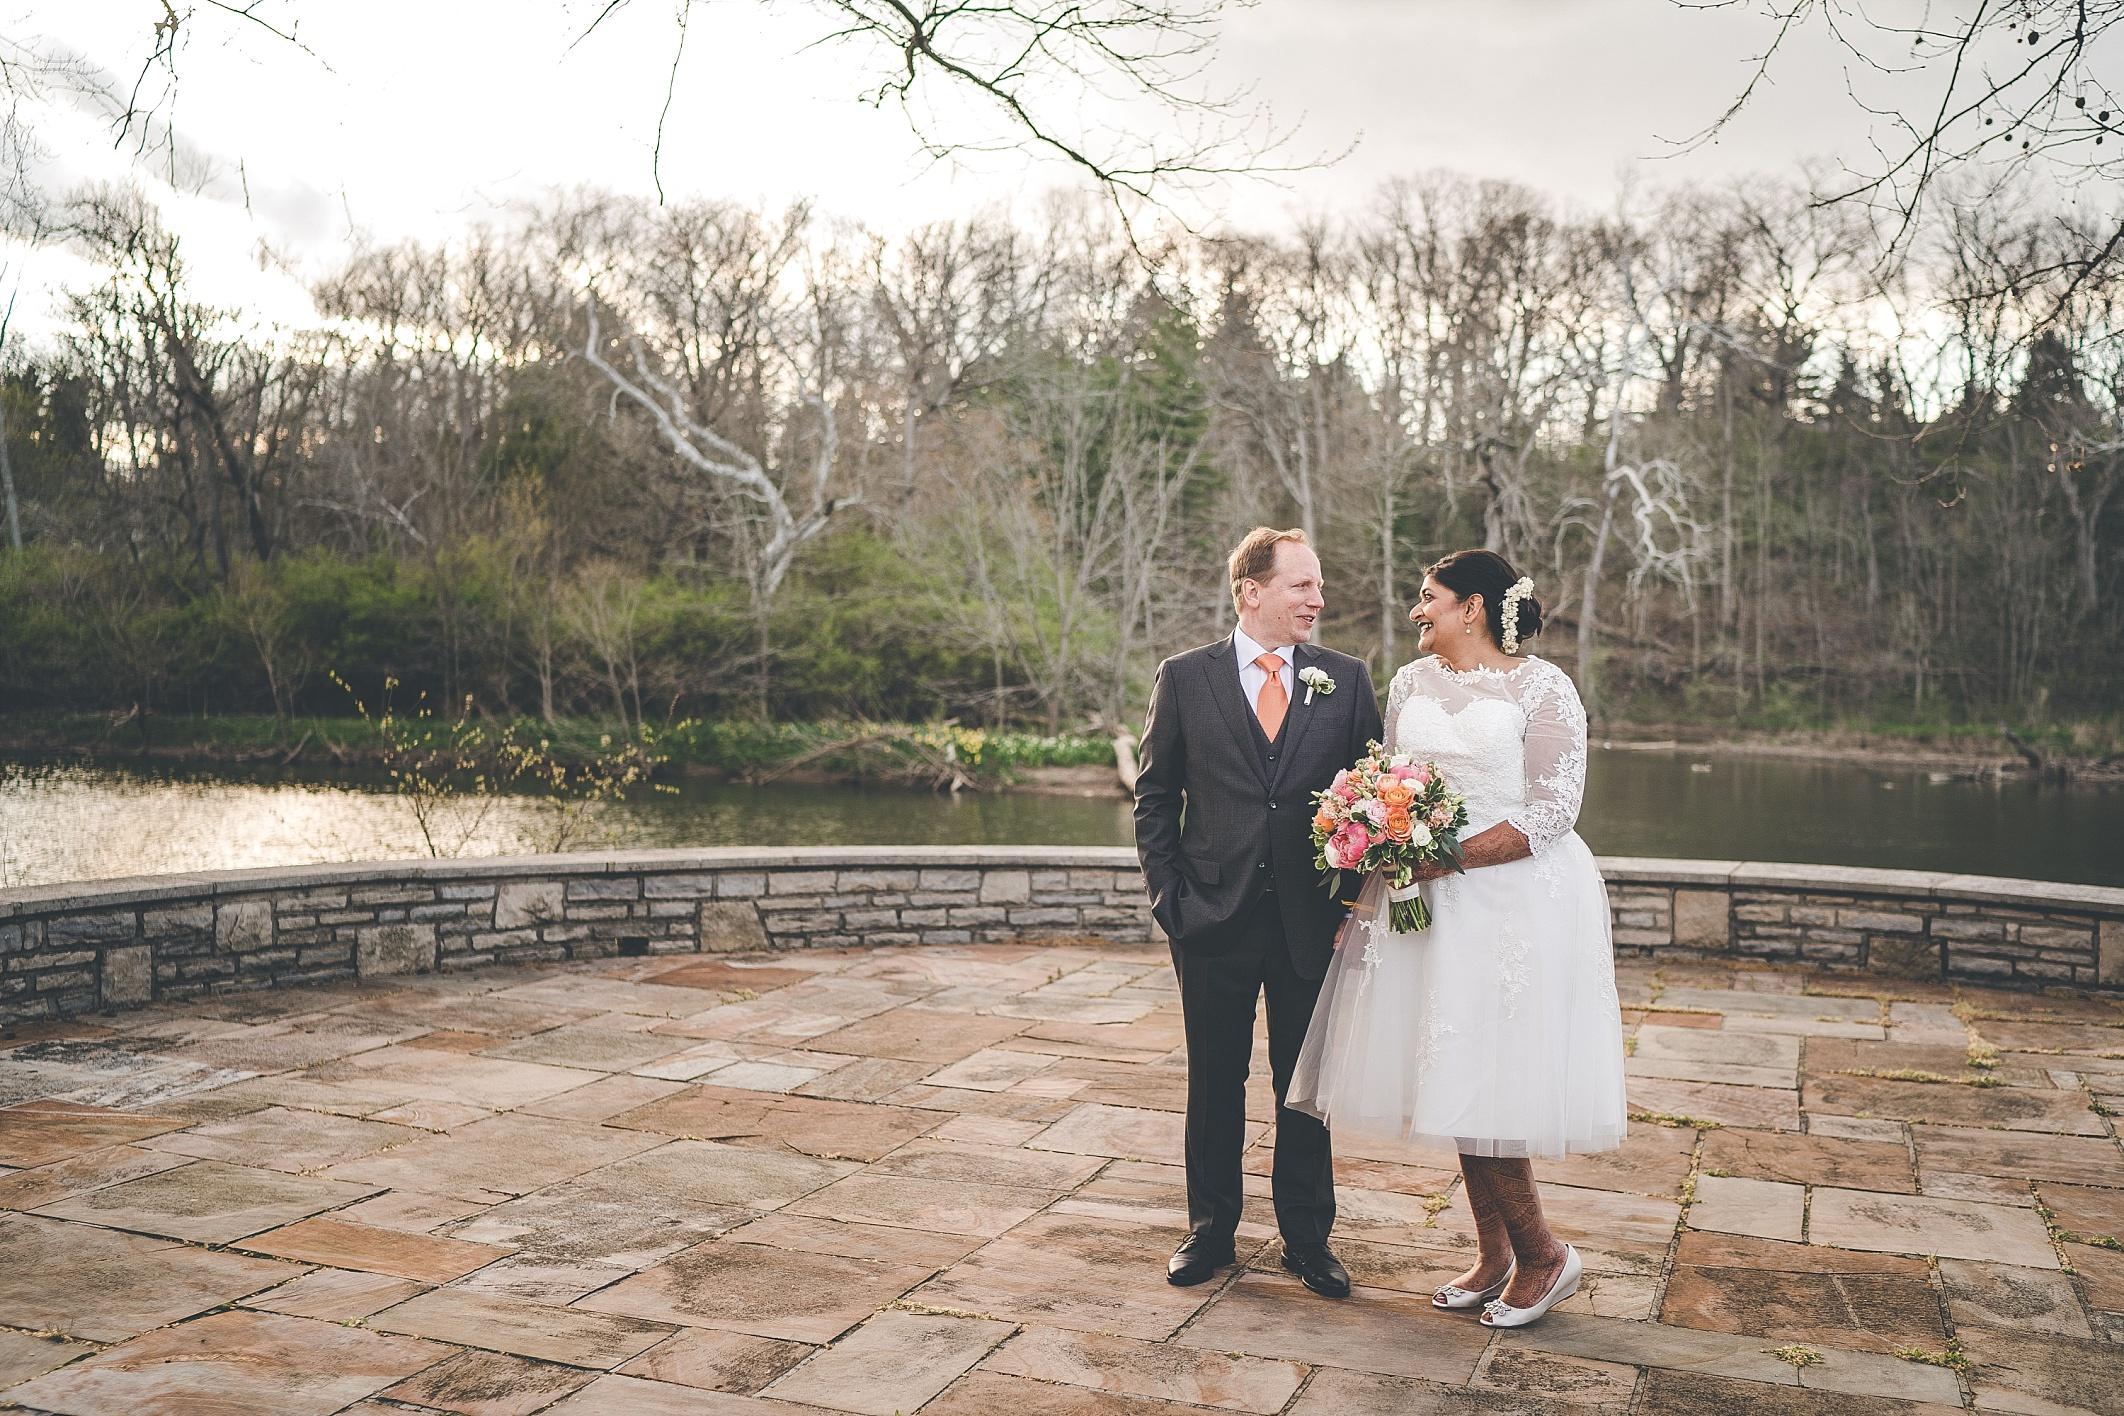 2714_dayton-indian-wedding-photographer-beavercreek_0069.jpg